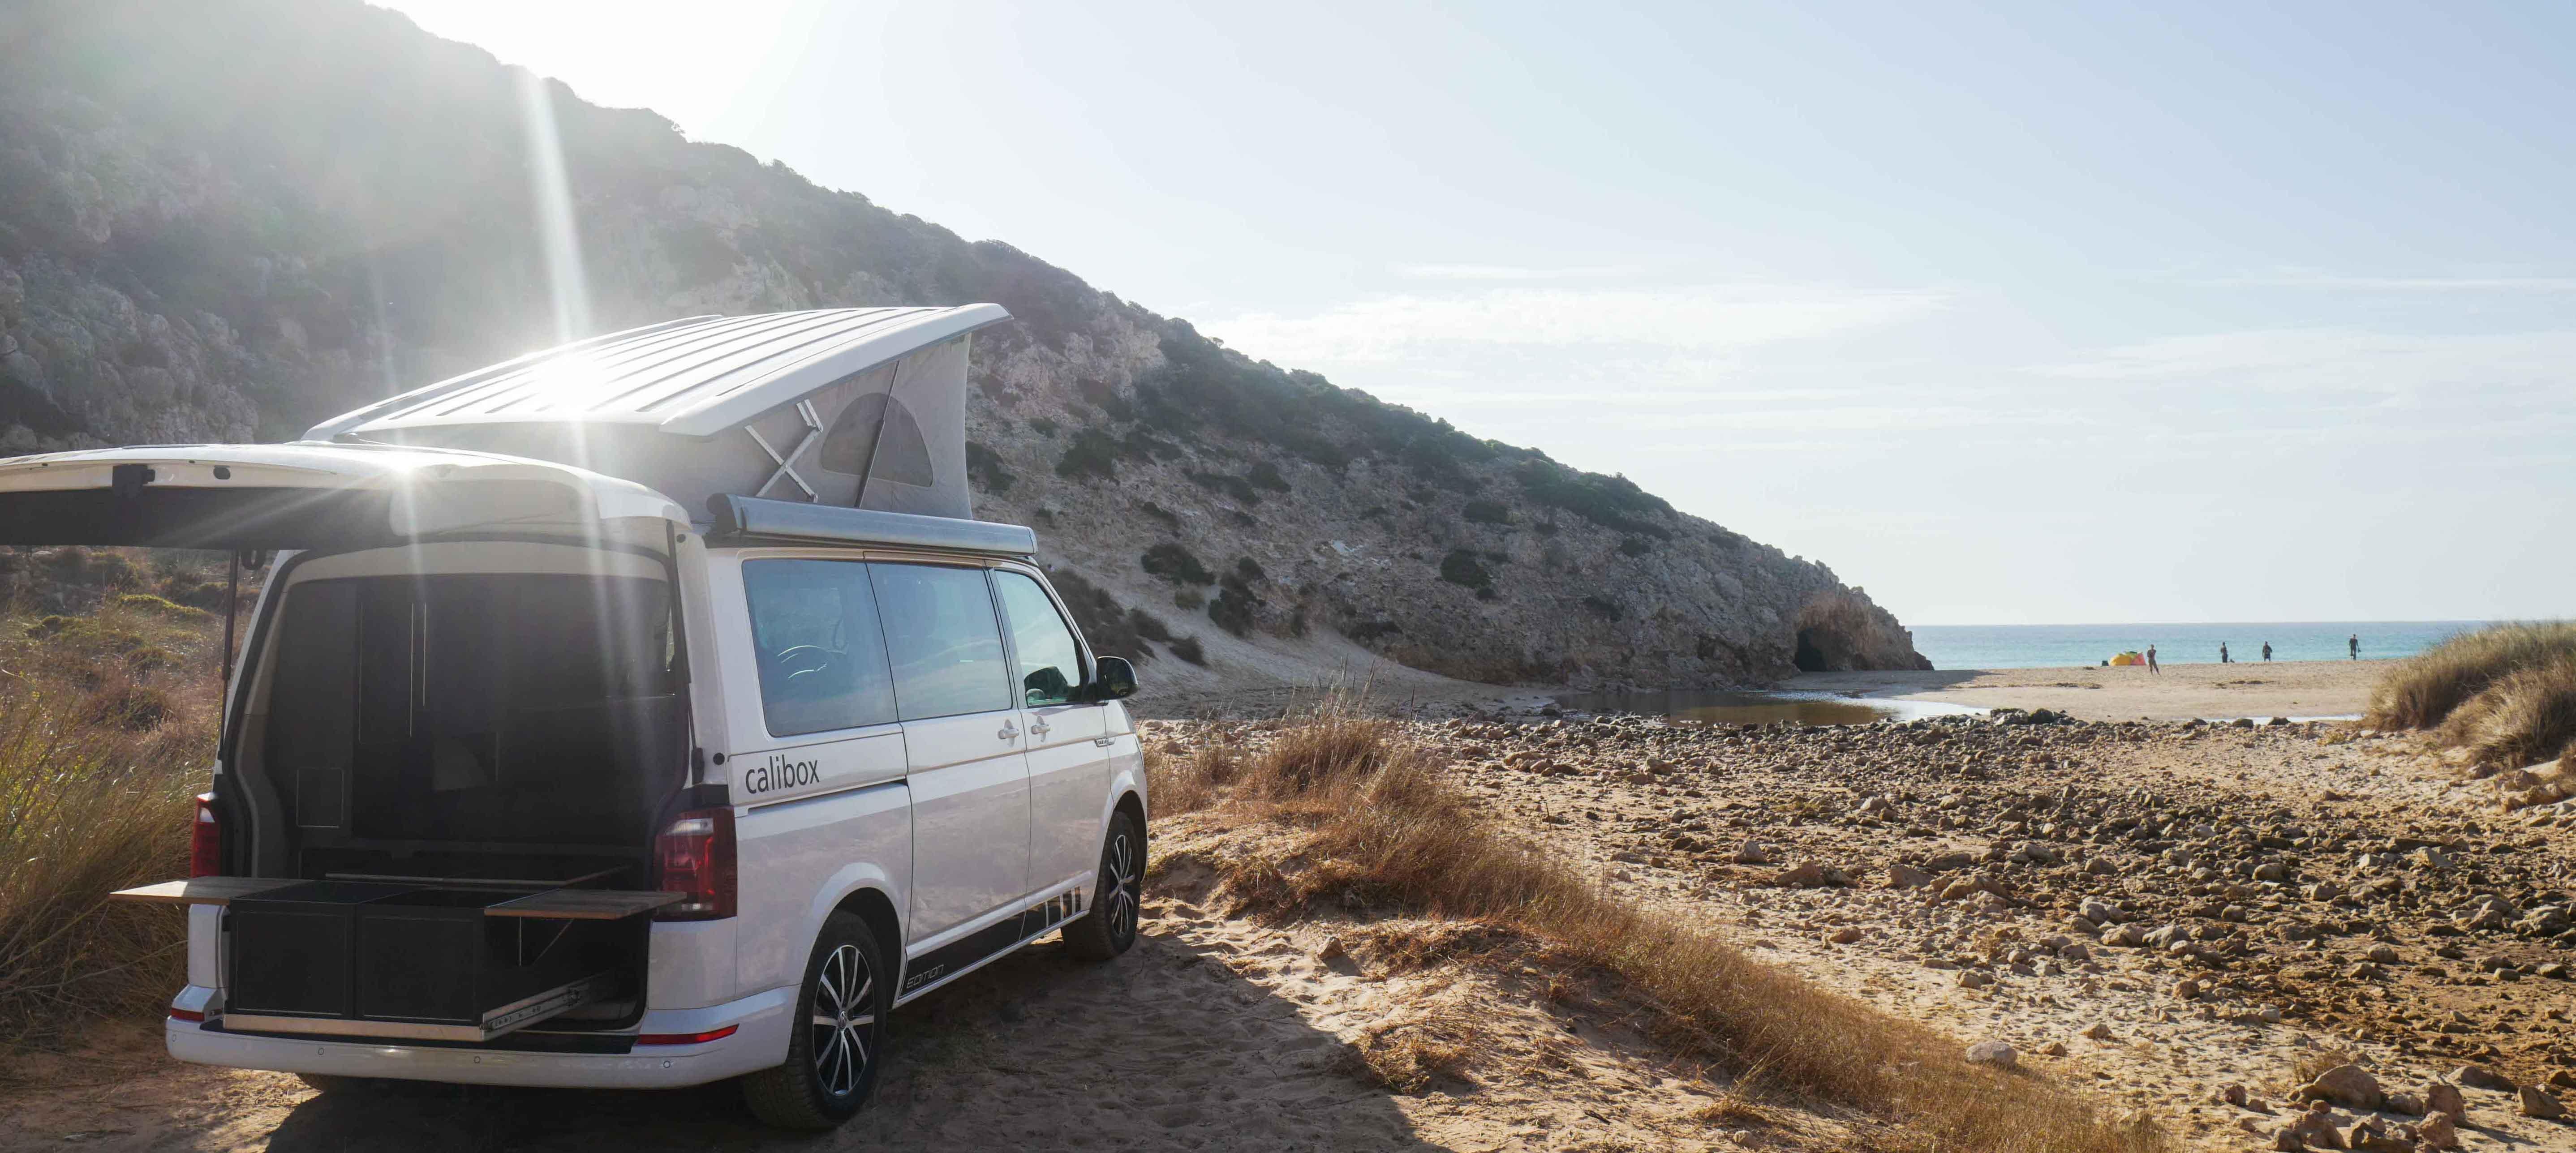 campingausbau vw california beach t5 und t6 calibox. Black Bedroom Furniture Sets. Home Design Ideas